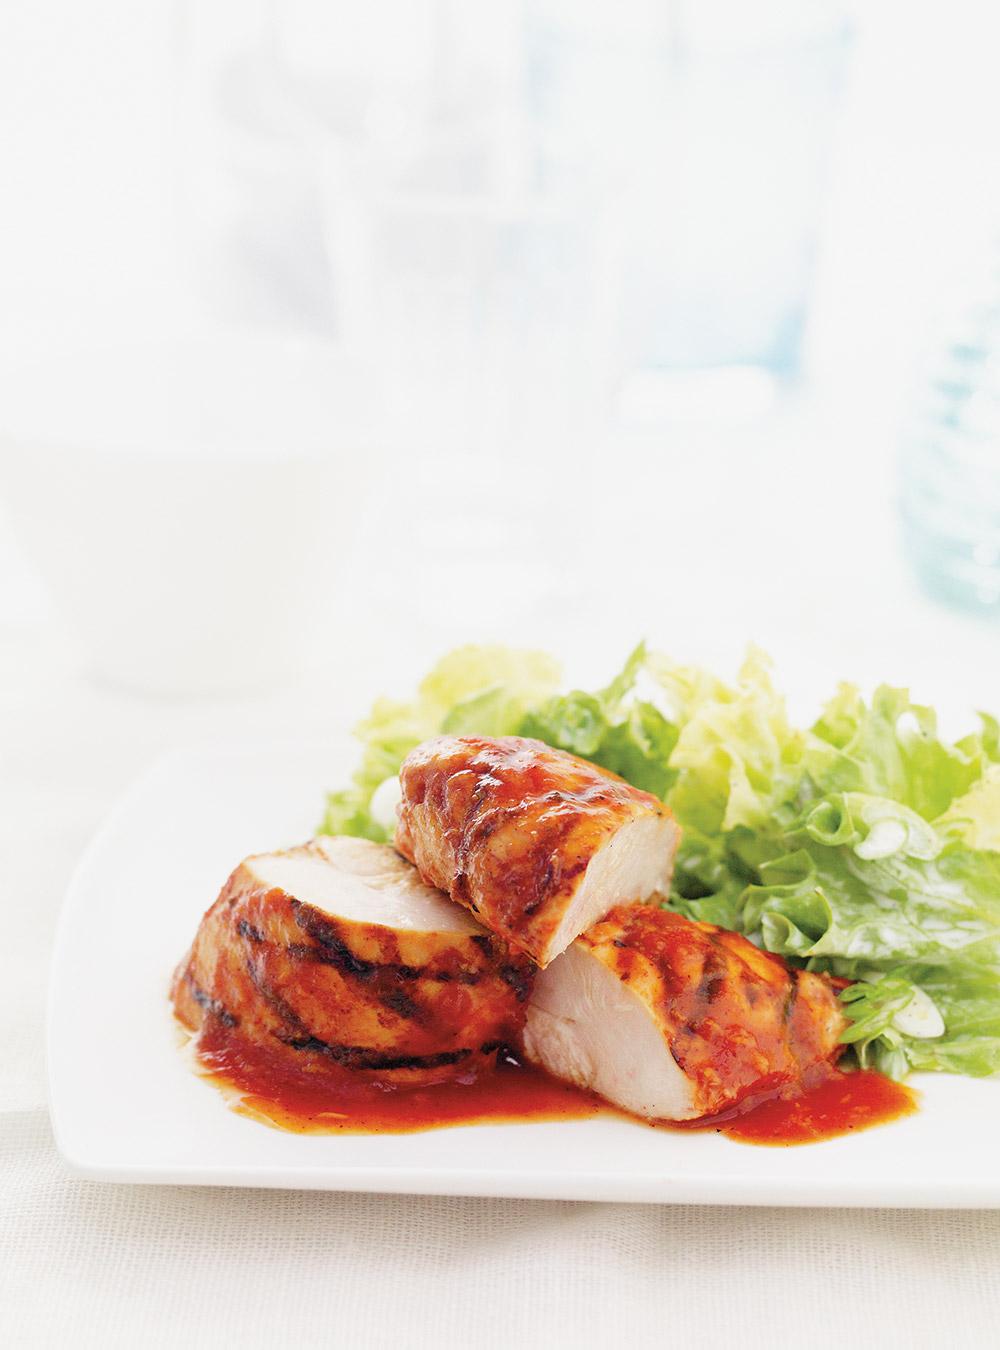 Poitrines de poulet barbecue